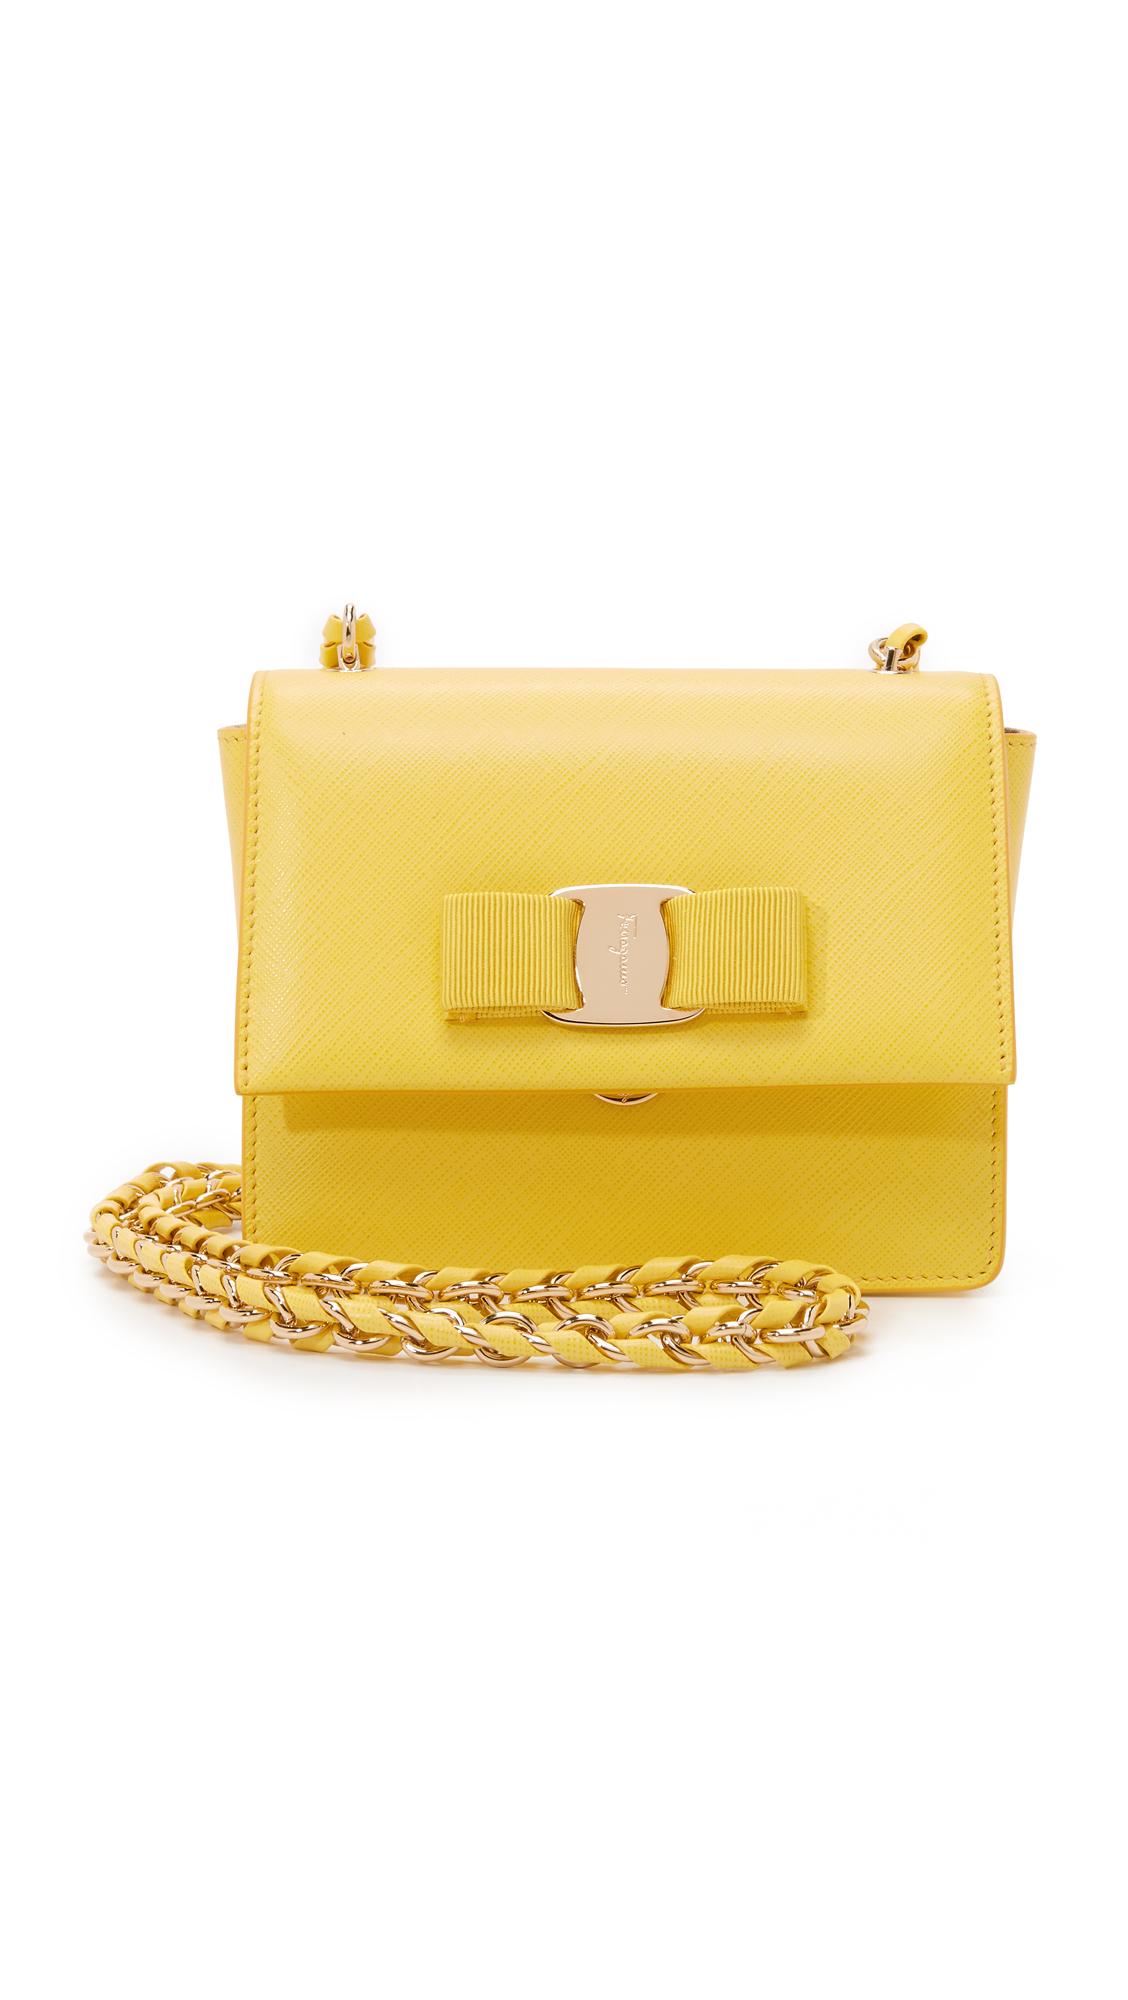 8ce78a405591 Lyst - Ferragamo Ginny Cross Body Bag in Yellow